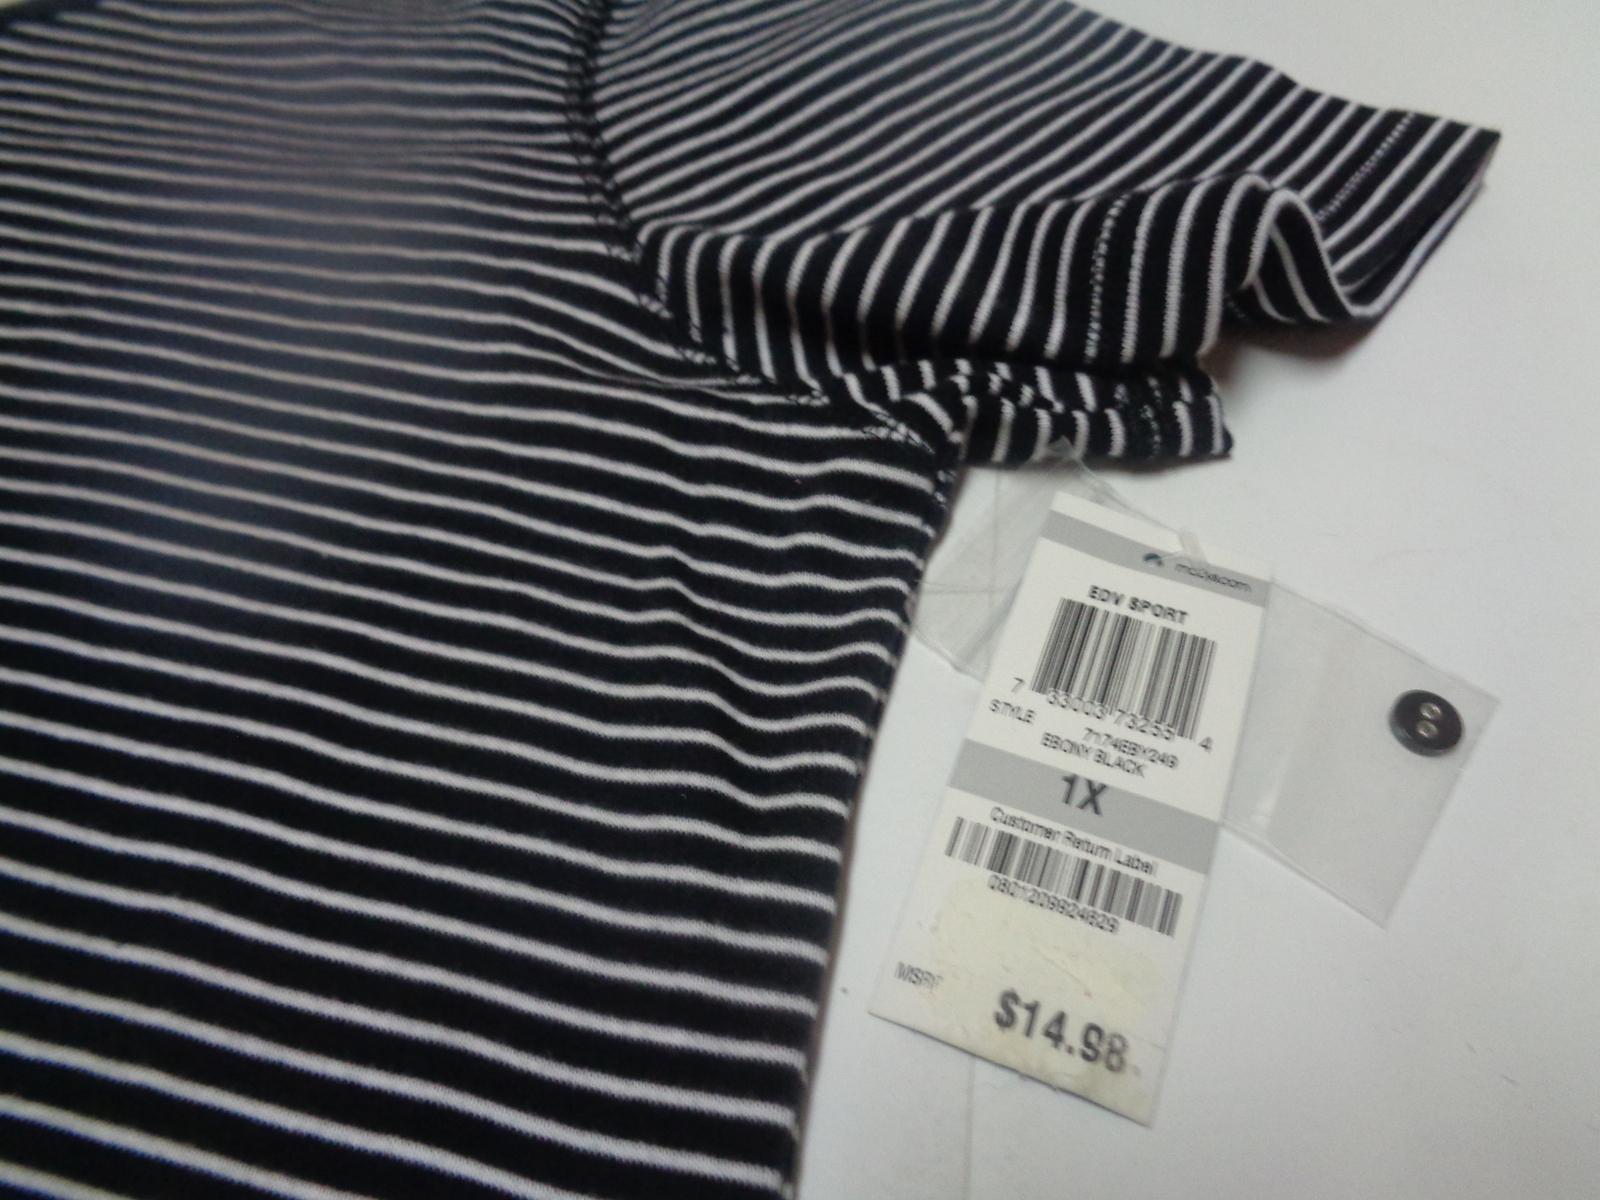 Karen Scott Women's Blouse Top Shirt Black & White Striped SZ 1X